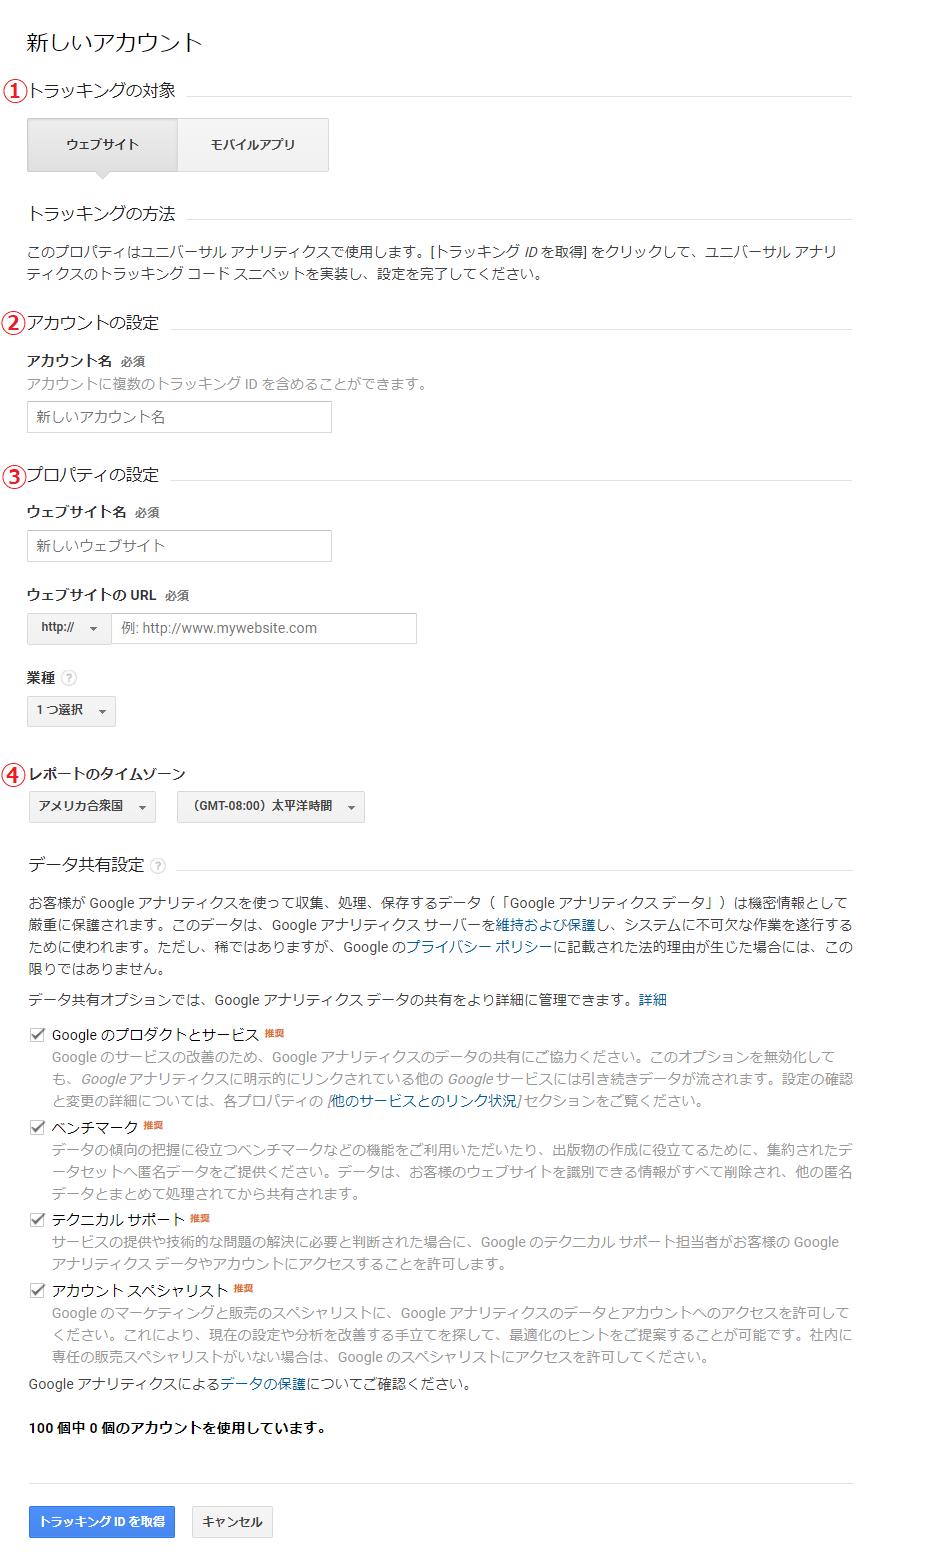 Googleアナリティクス設定方法の5分でわかる簡単ガイド!【登録や見方、使い方】